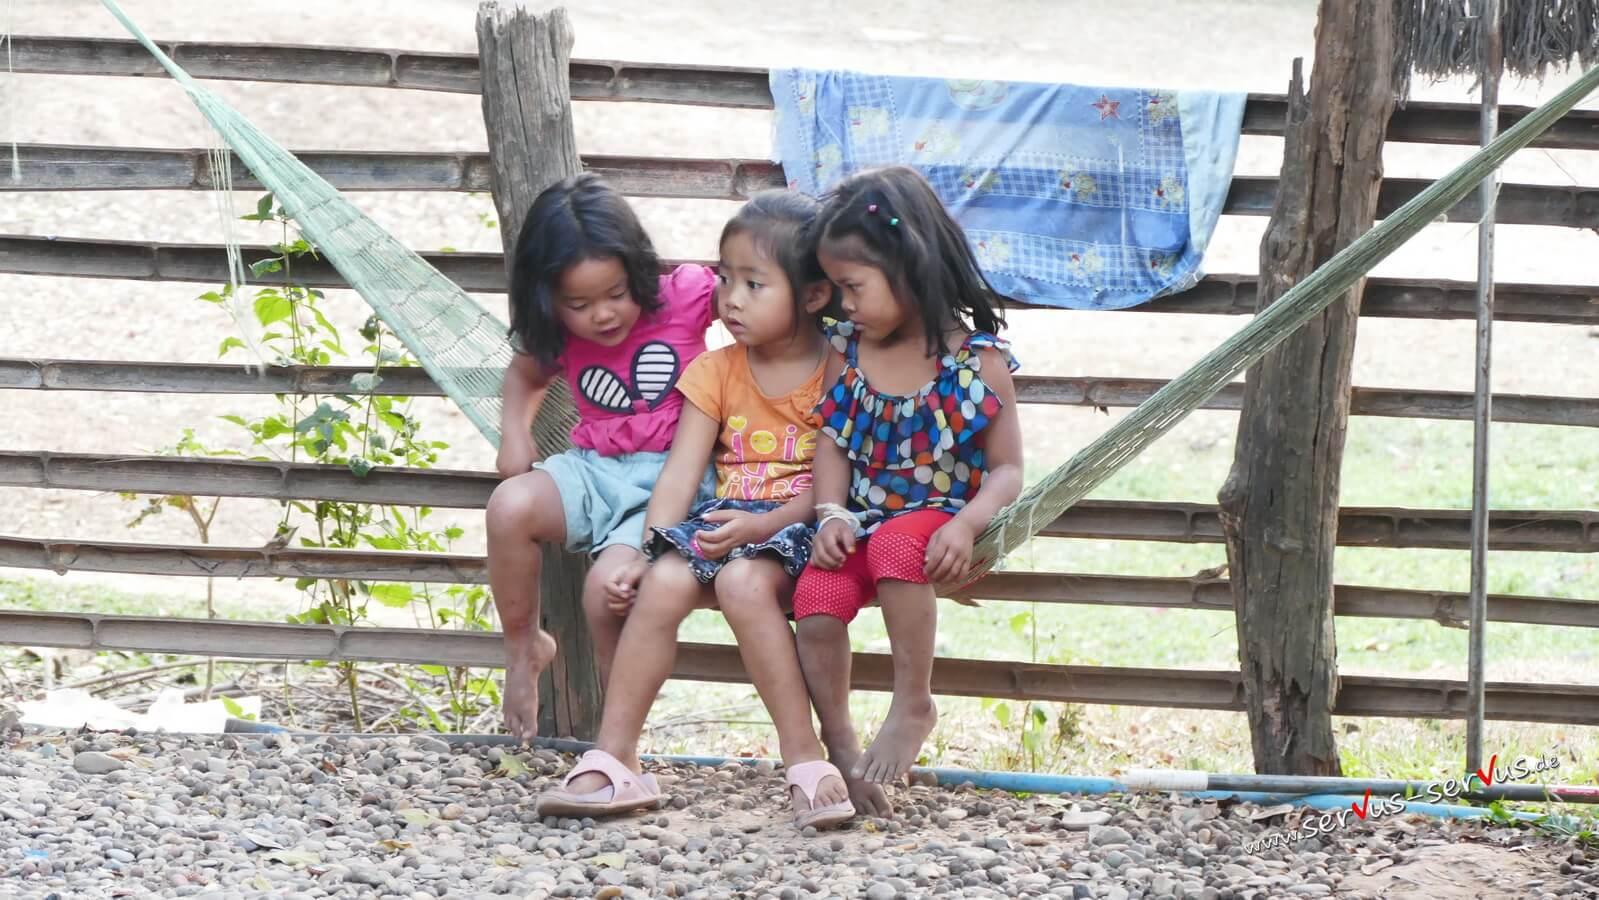 Hängematte mit Kinder, Laos, Bolavenplatea